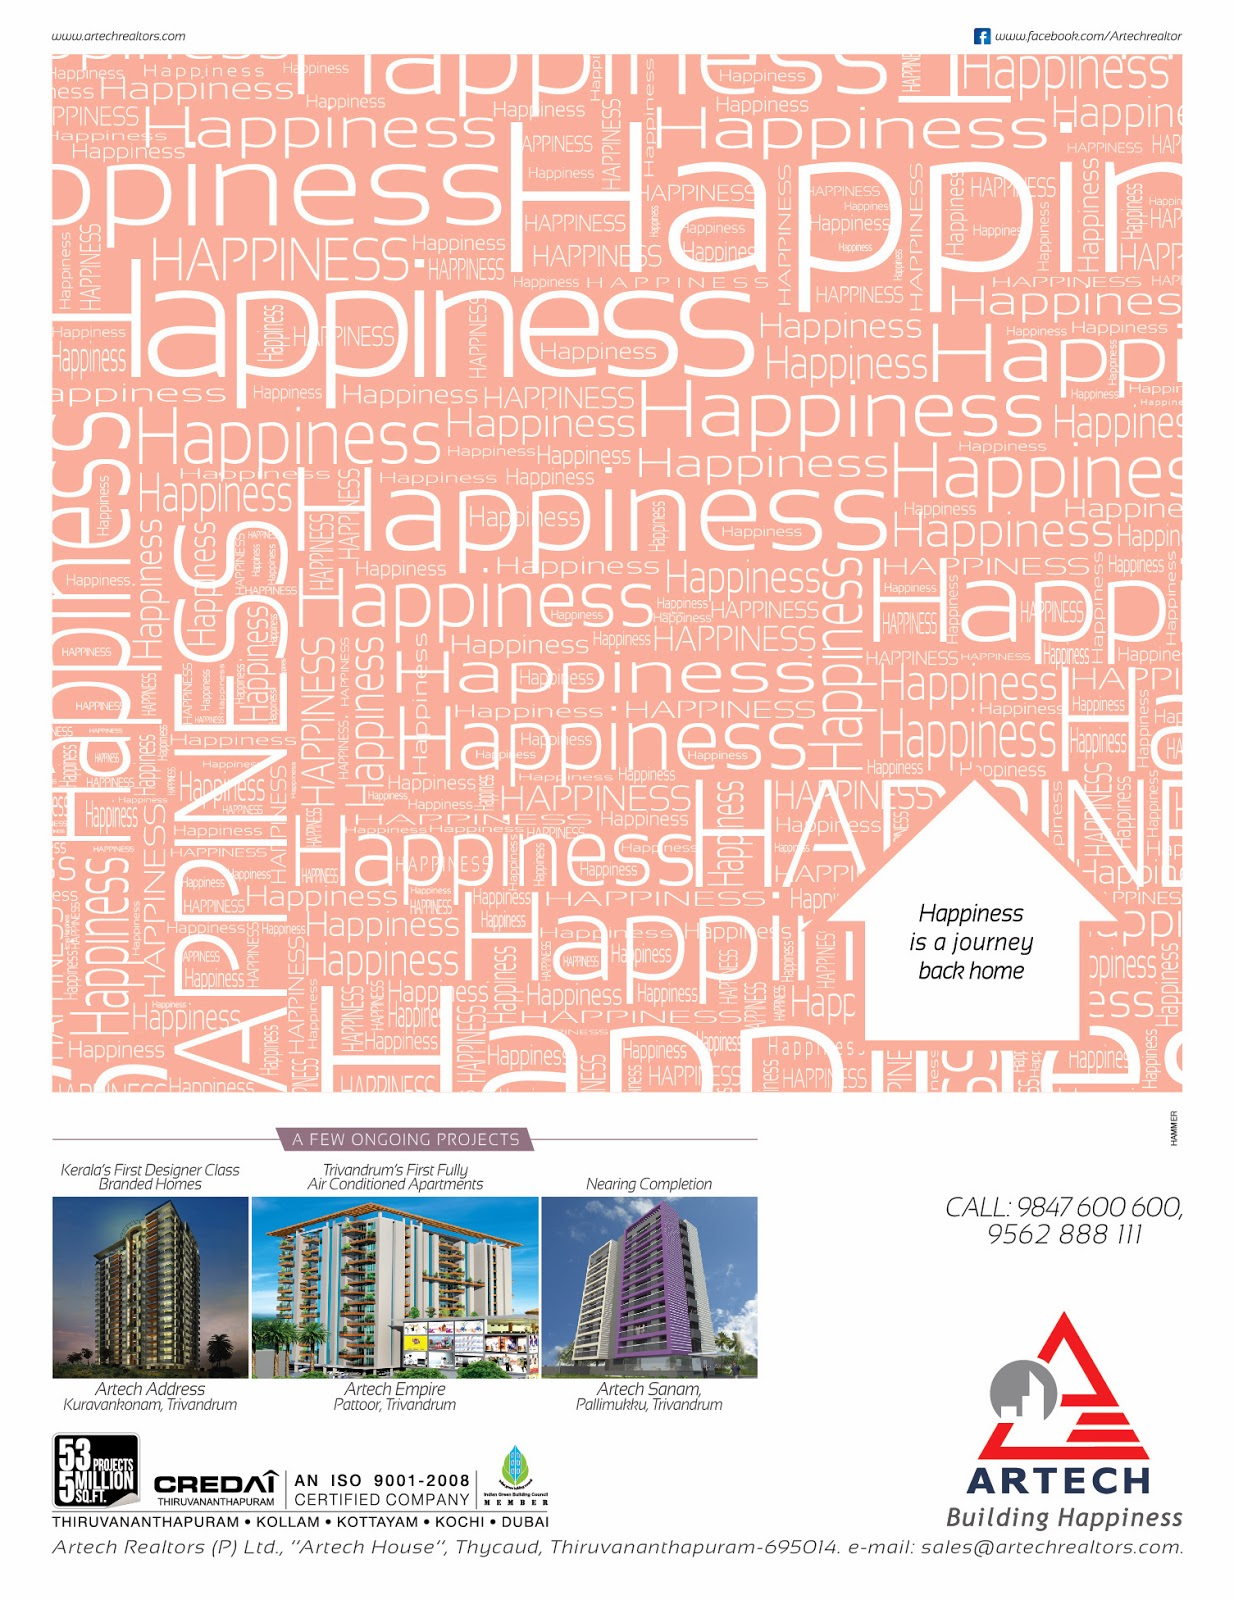 Ads for Artech Builders, Agency: HAMMER    Abhithilak